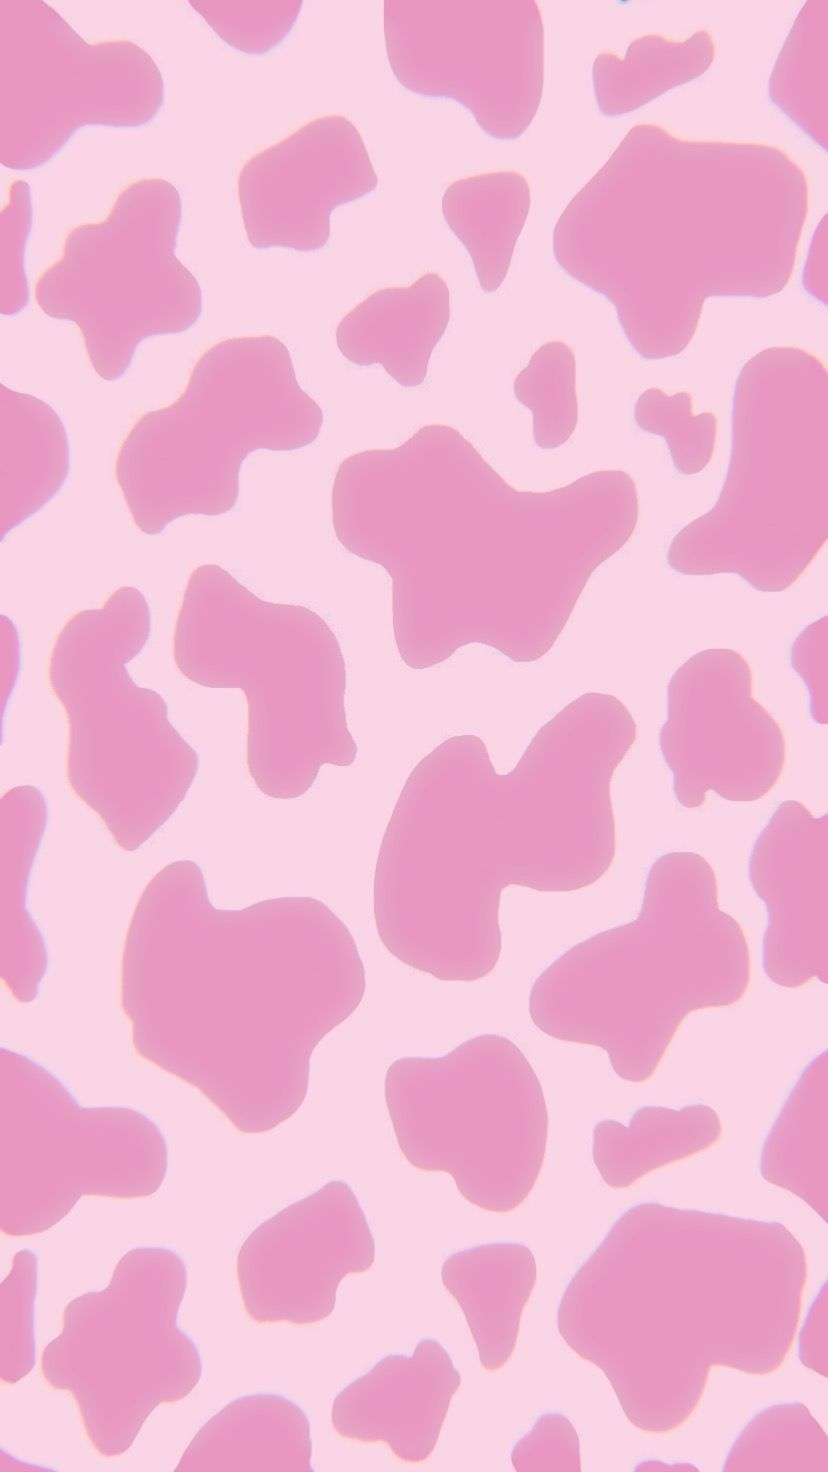 Pink Cow Print Alisakolesnyk Wallpaper Cow Pink In Cow Print Wallpaper Cute Patterns Wallpaper Edgy Wallpaper